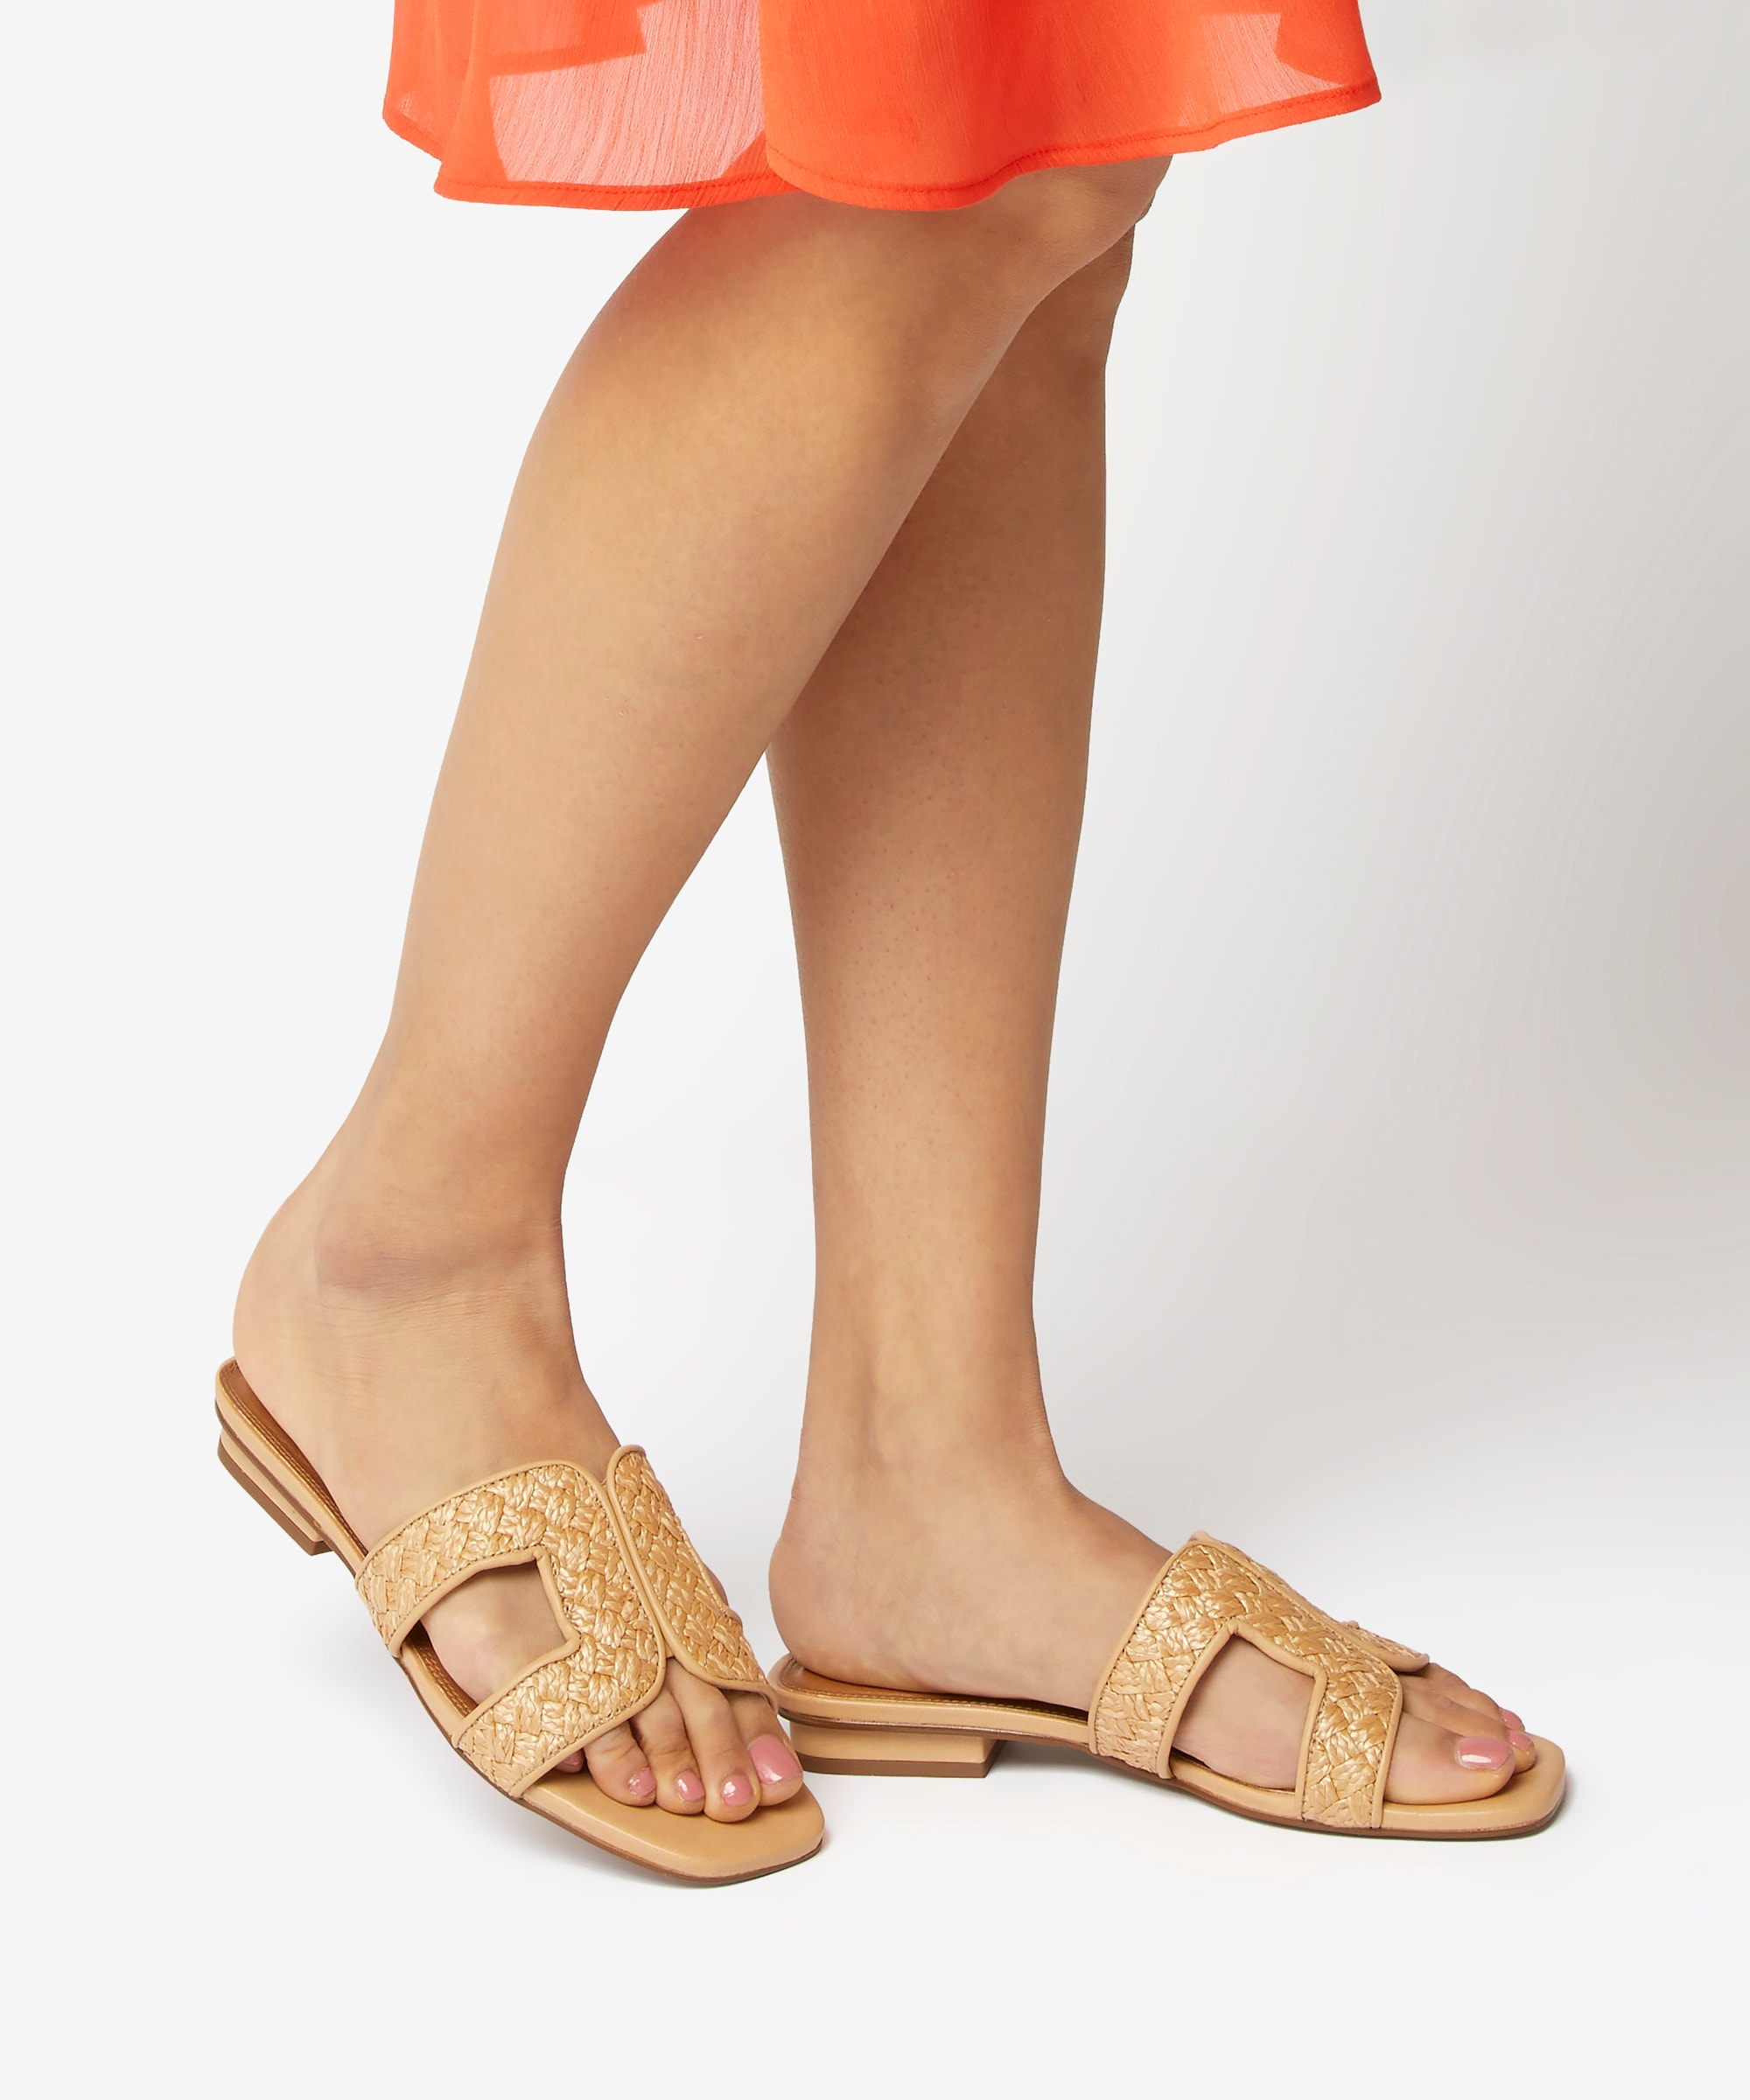 thumbnail 8 - Dune Ladies LOUPE Smart Slider Sandals